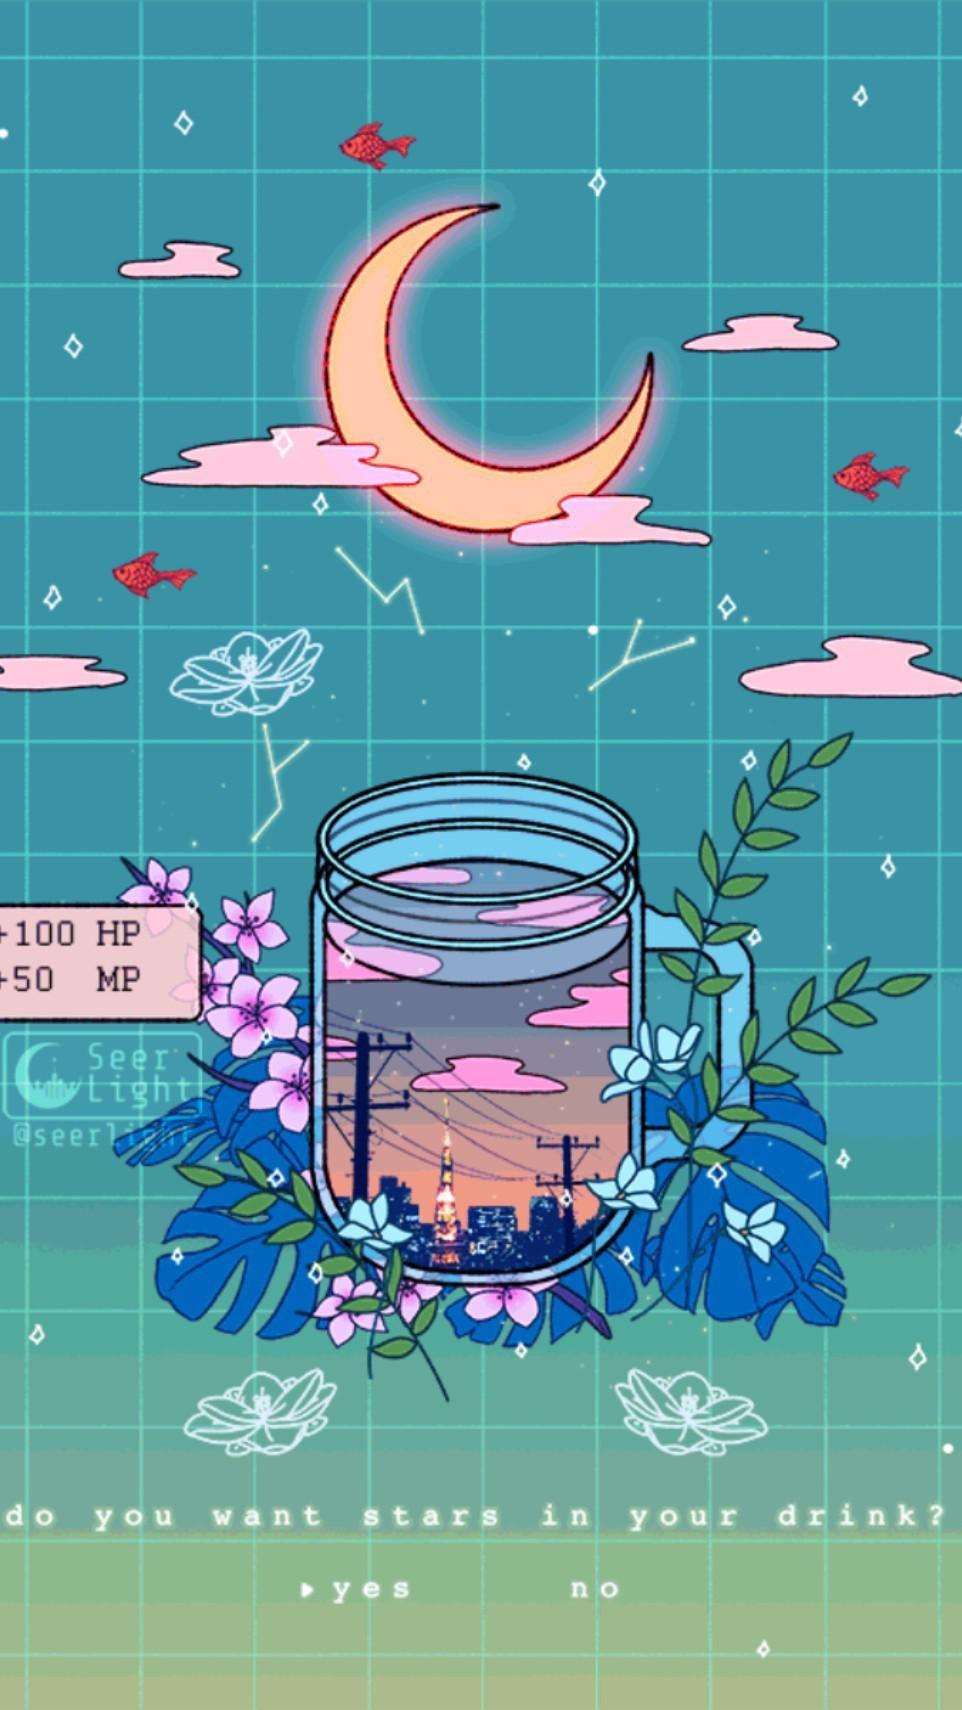 SeerLight Wallpaper ✨✨